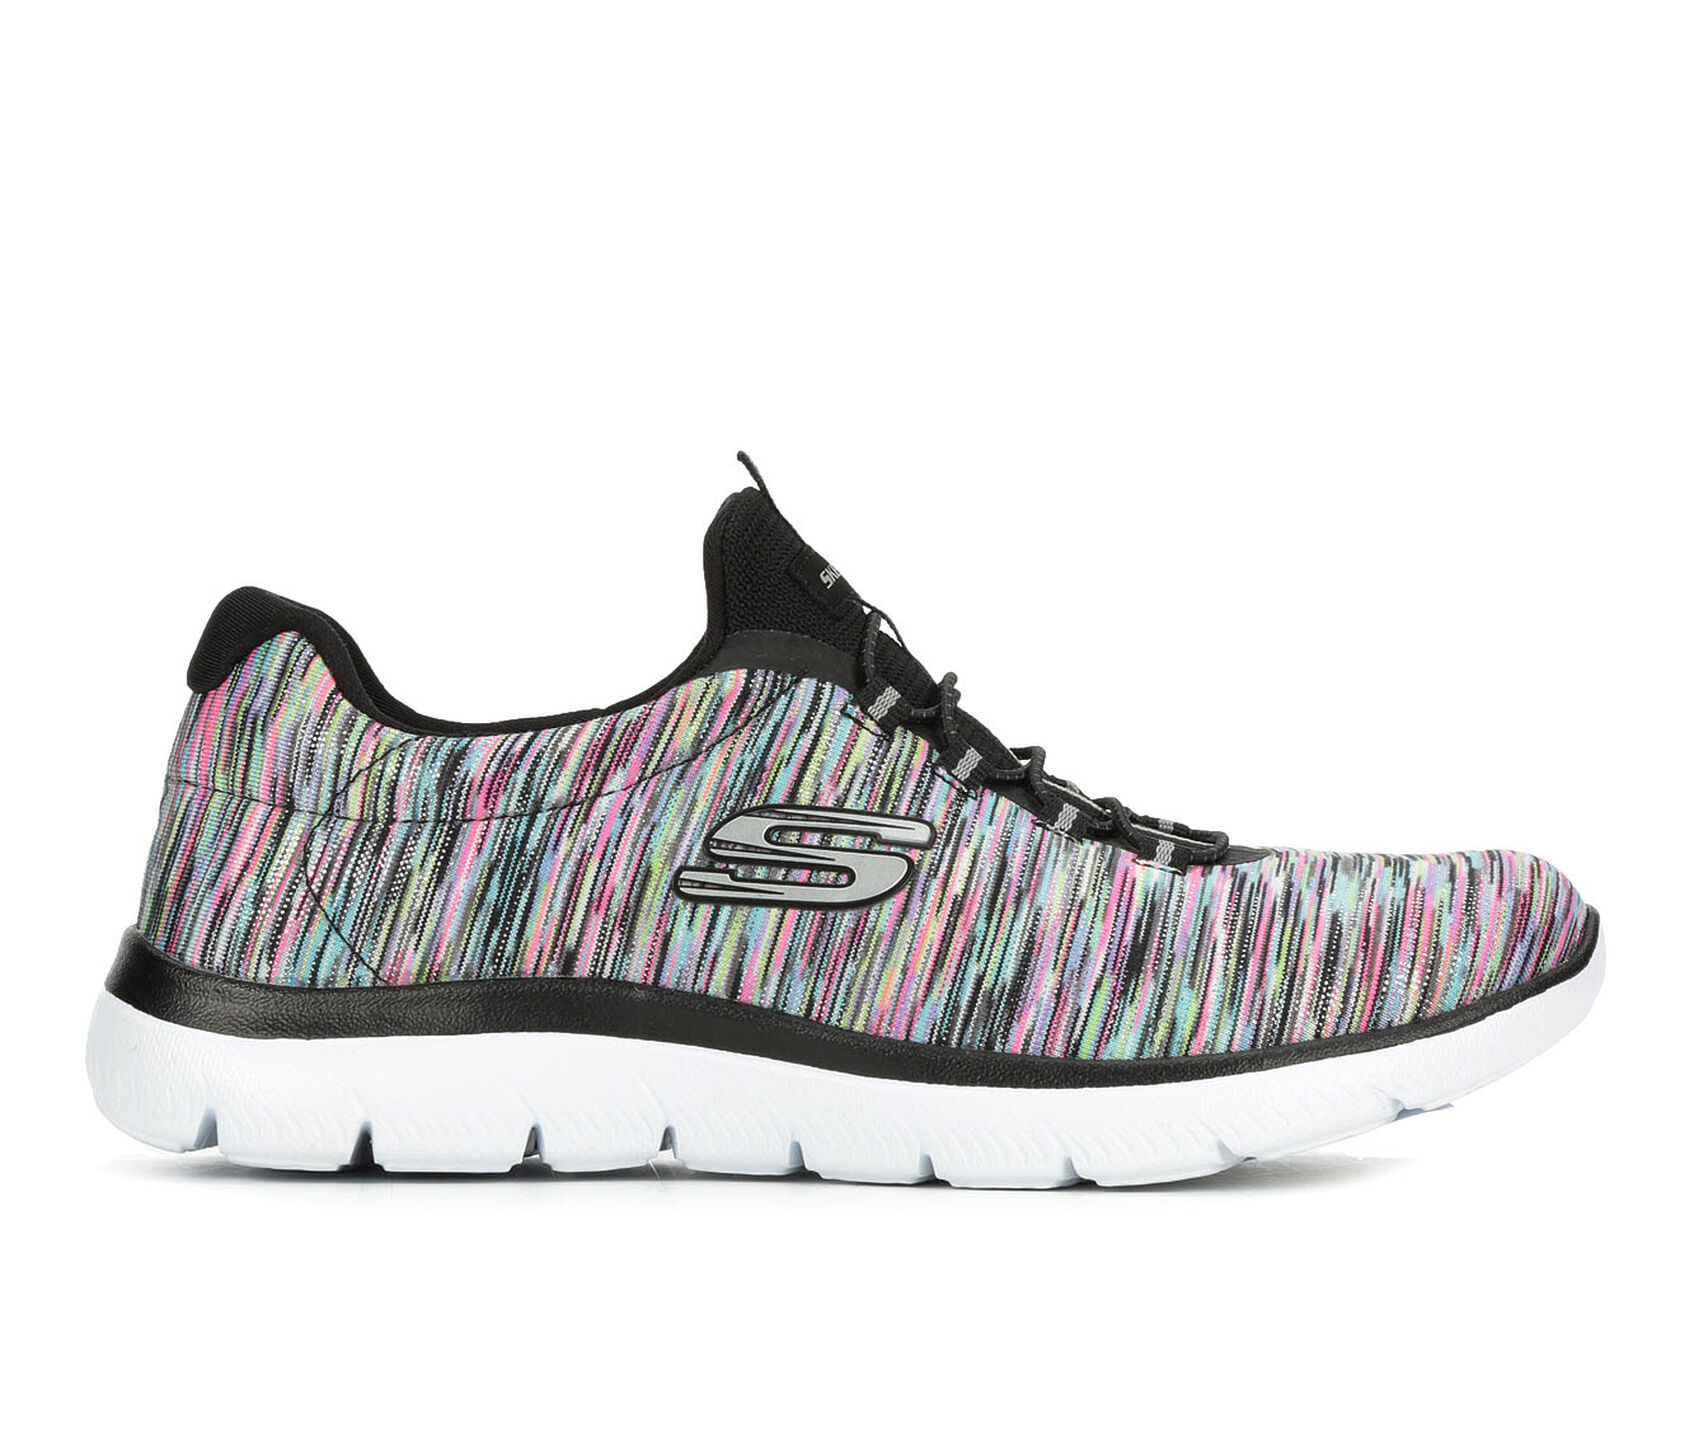 2dcadcf9eebc Women s Skechers Light Dreaming 12984 Slip-On Sneakers